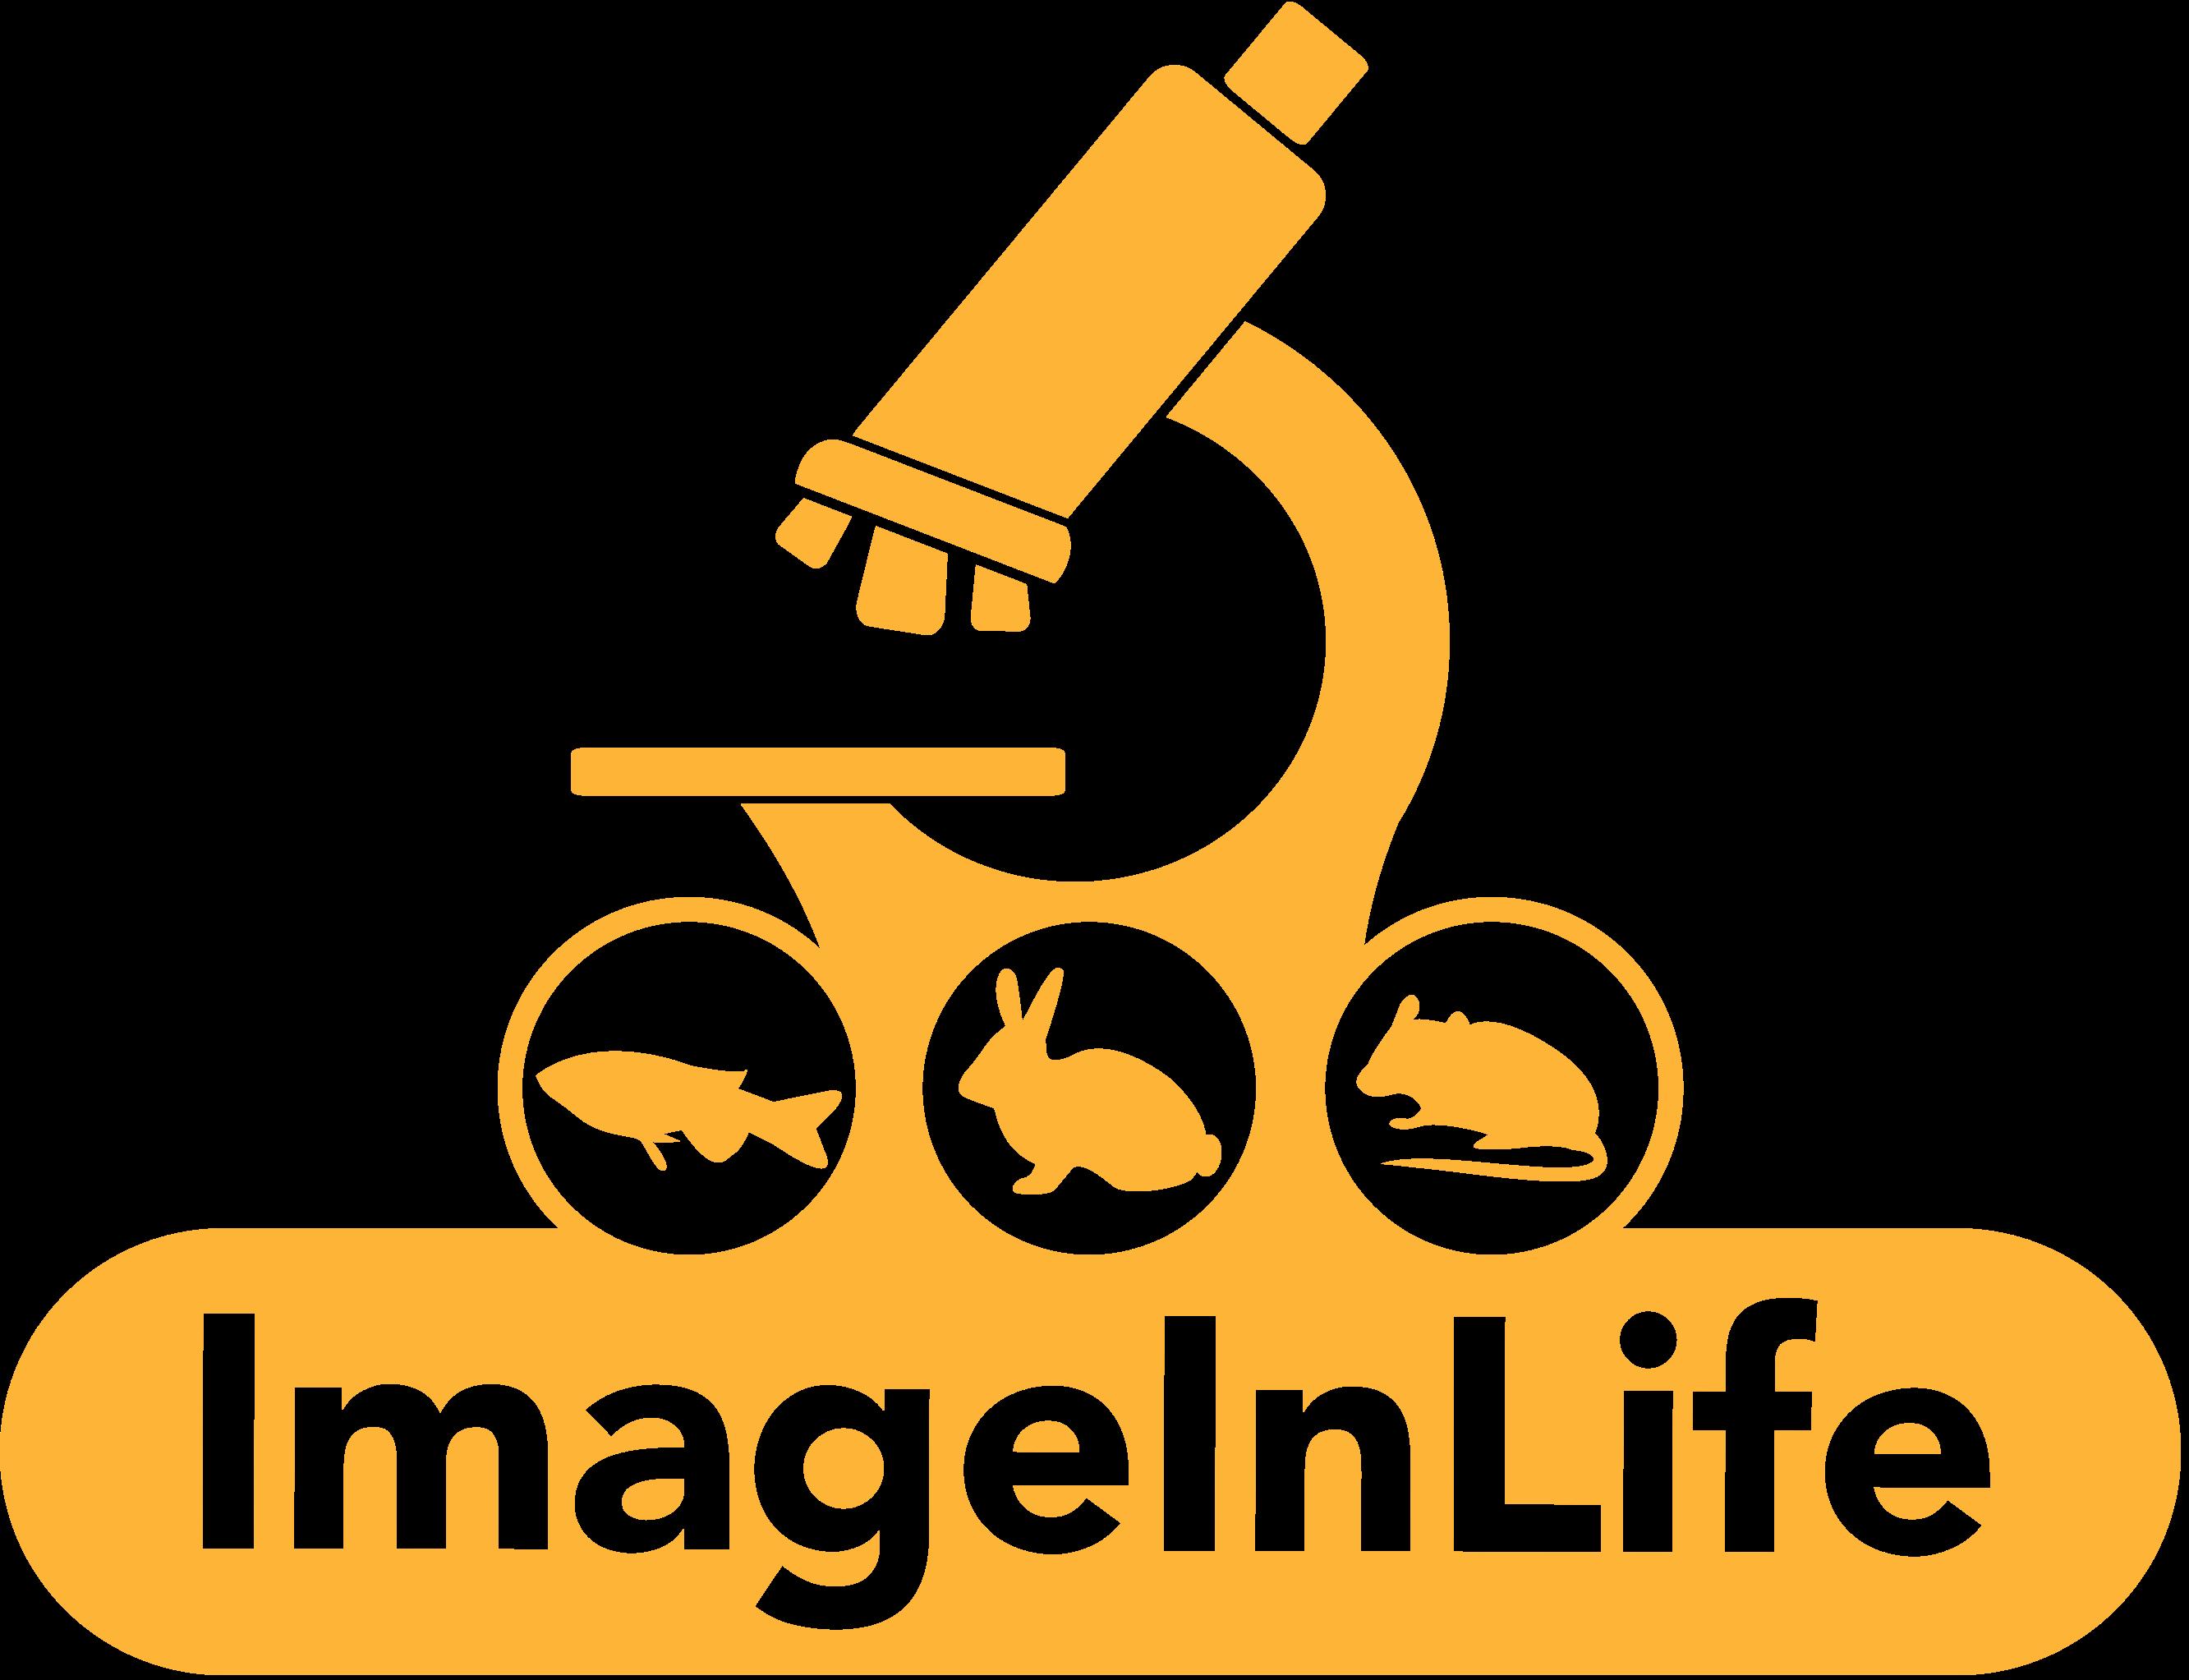 ImageInLife